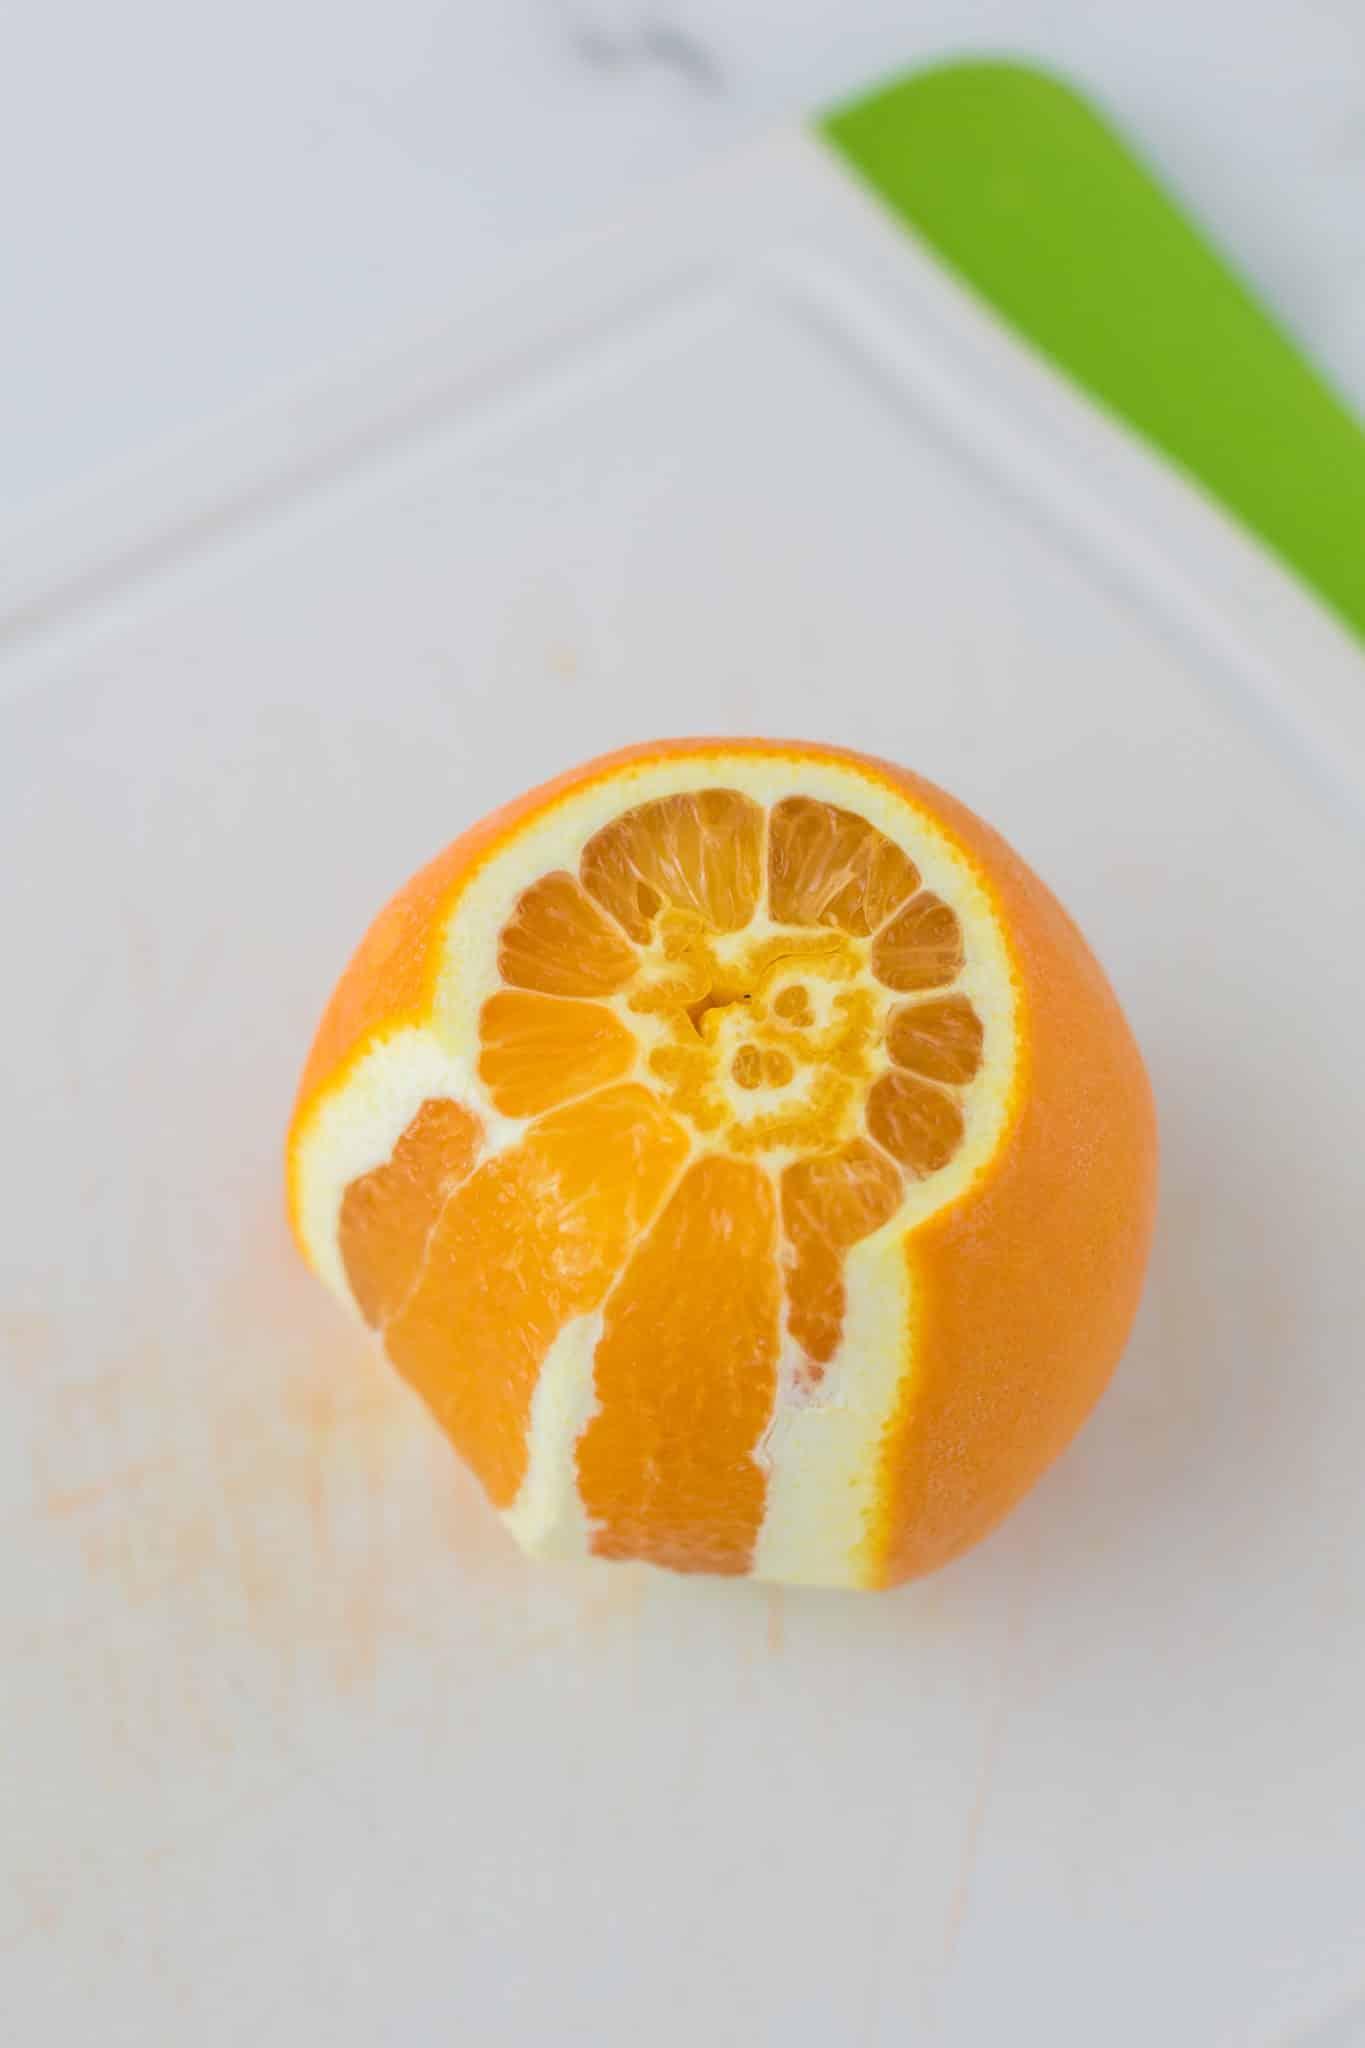 half-peeled orange on a cutting board